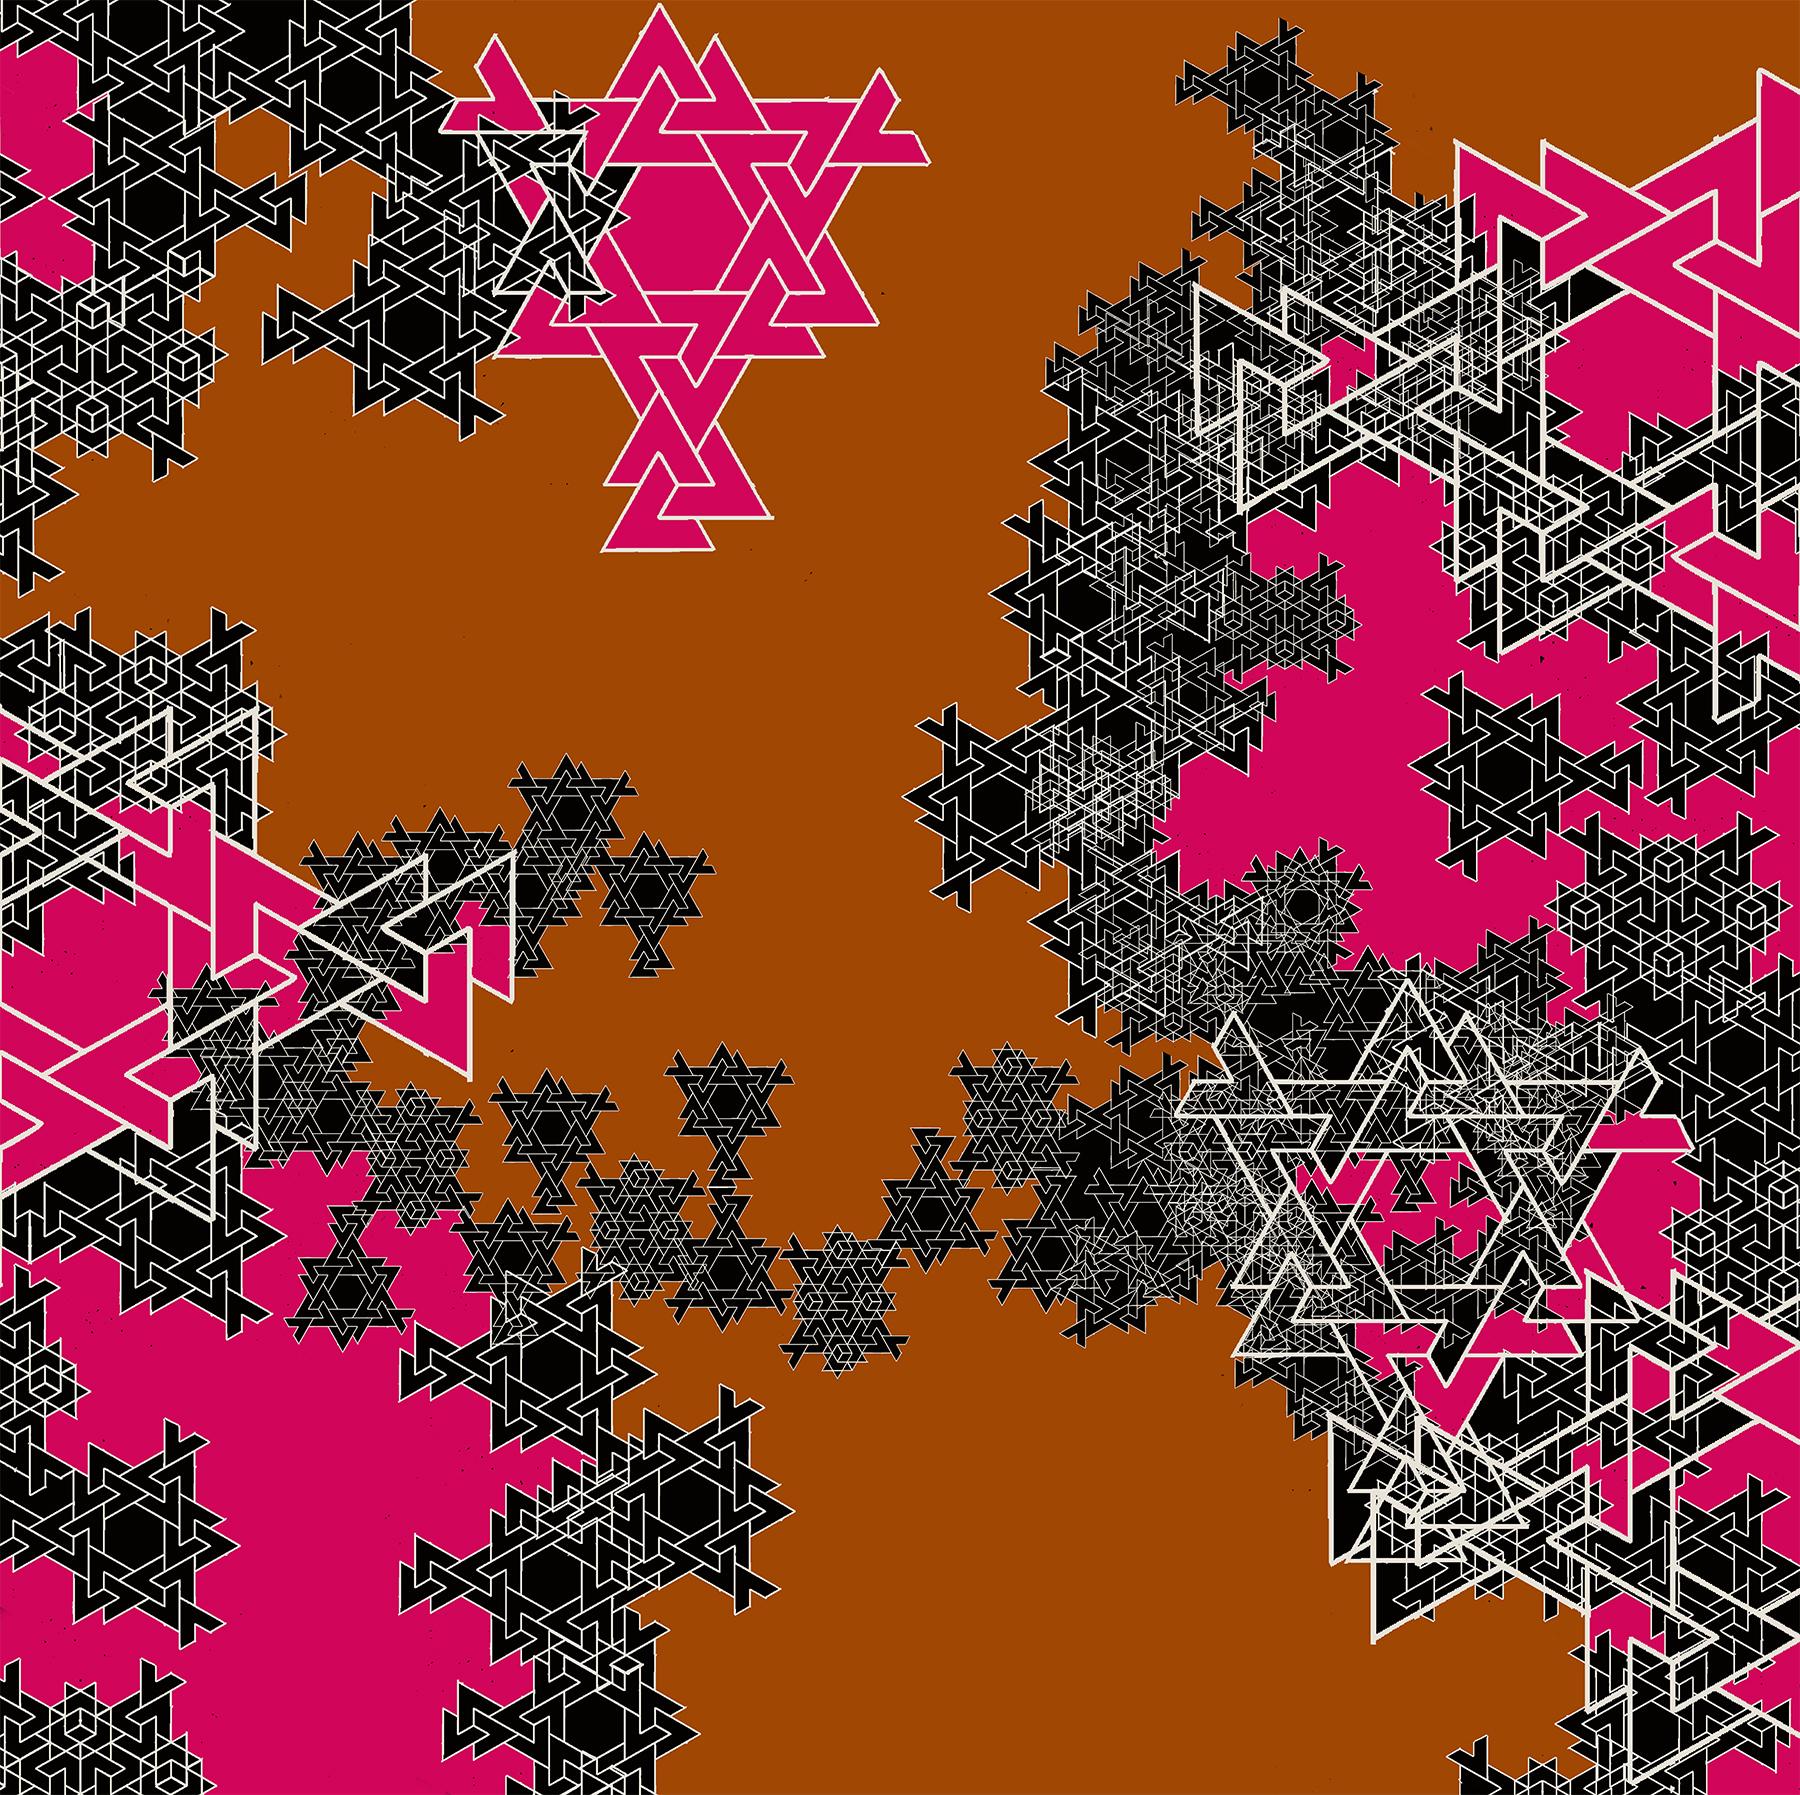 rug w patterns 22-.jpg